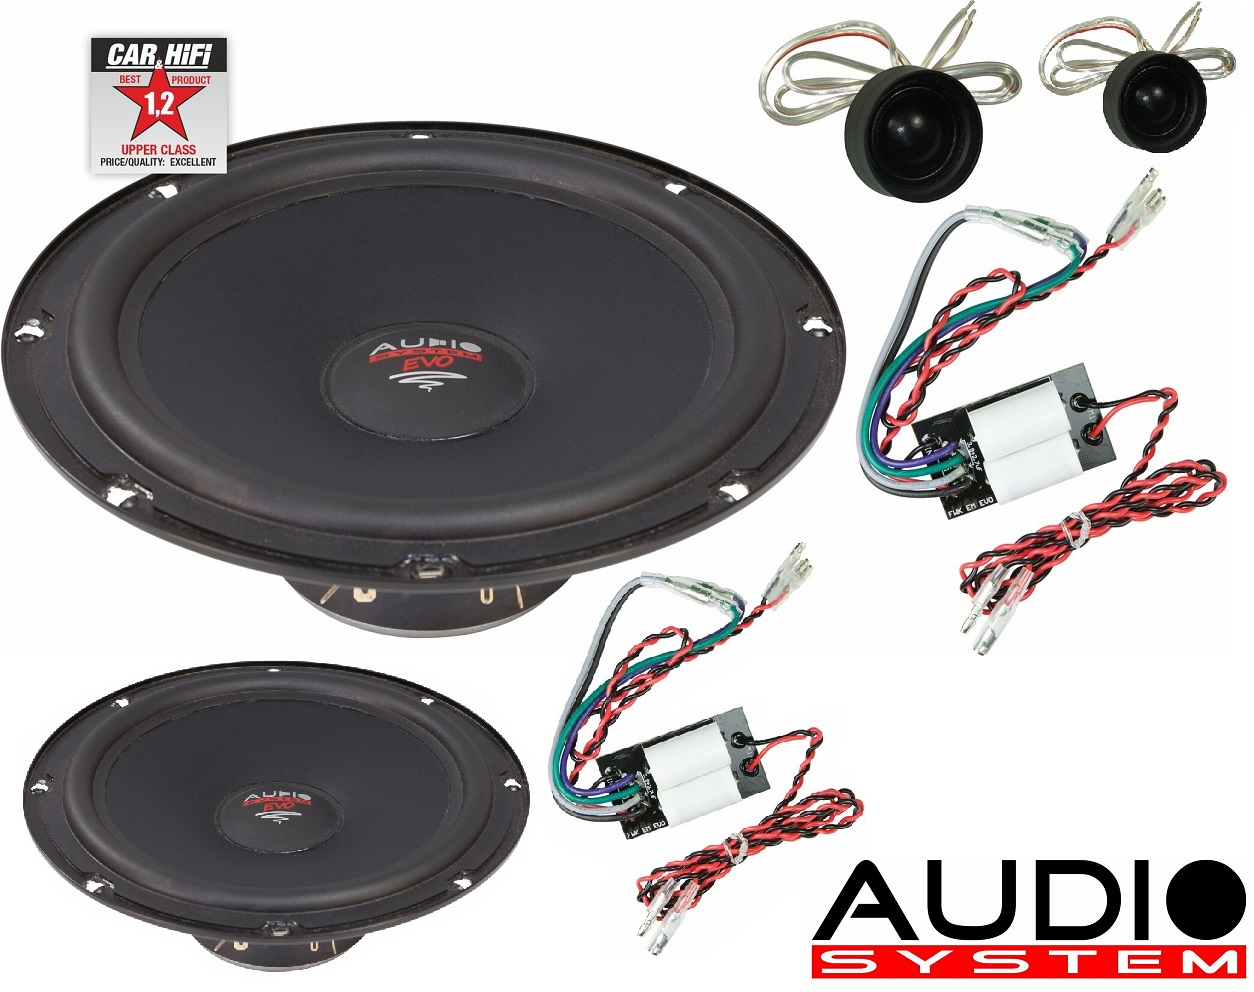 Audio System X 200 EM EVO X--ion SERIES 20cm 2-Wege Lautsprecher System